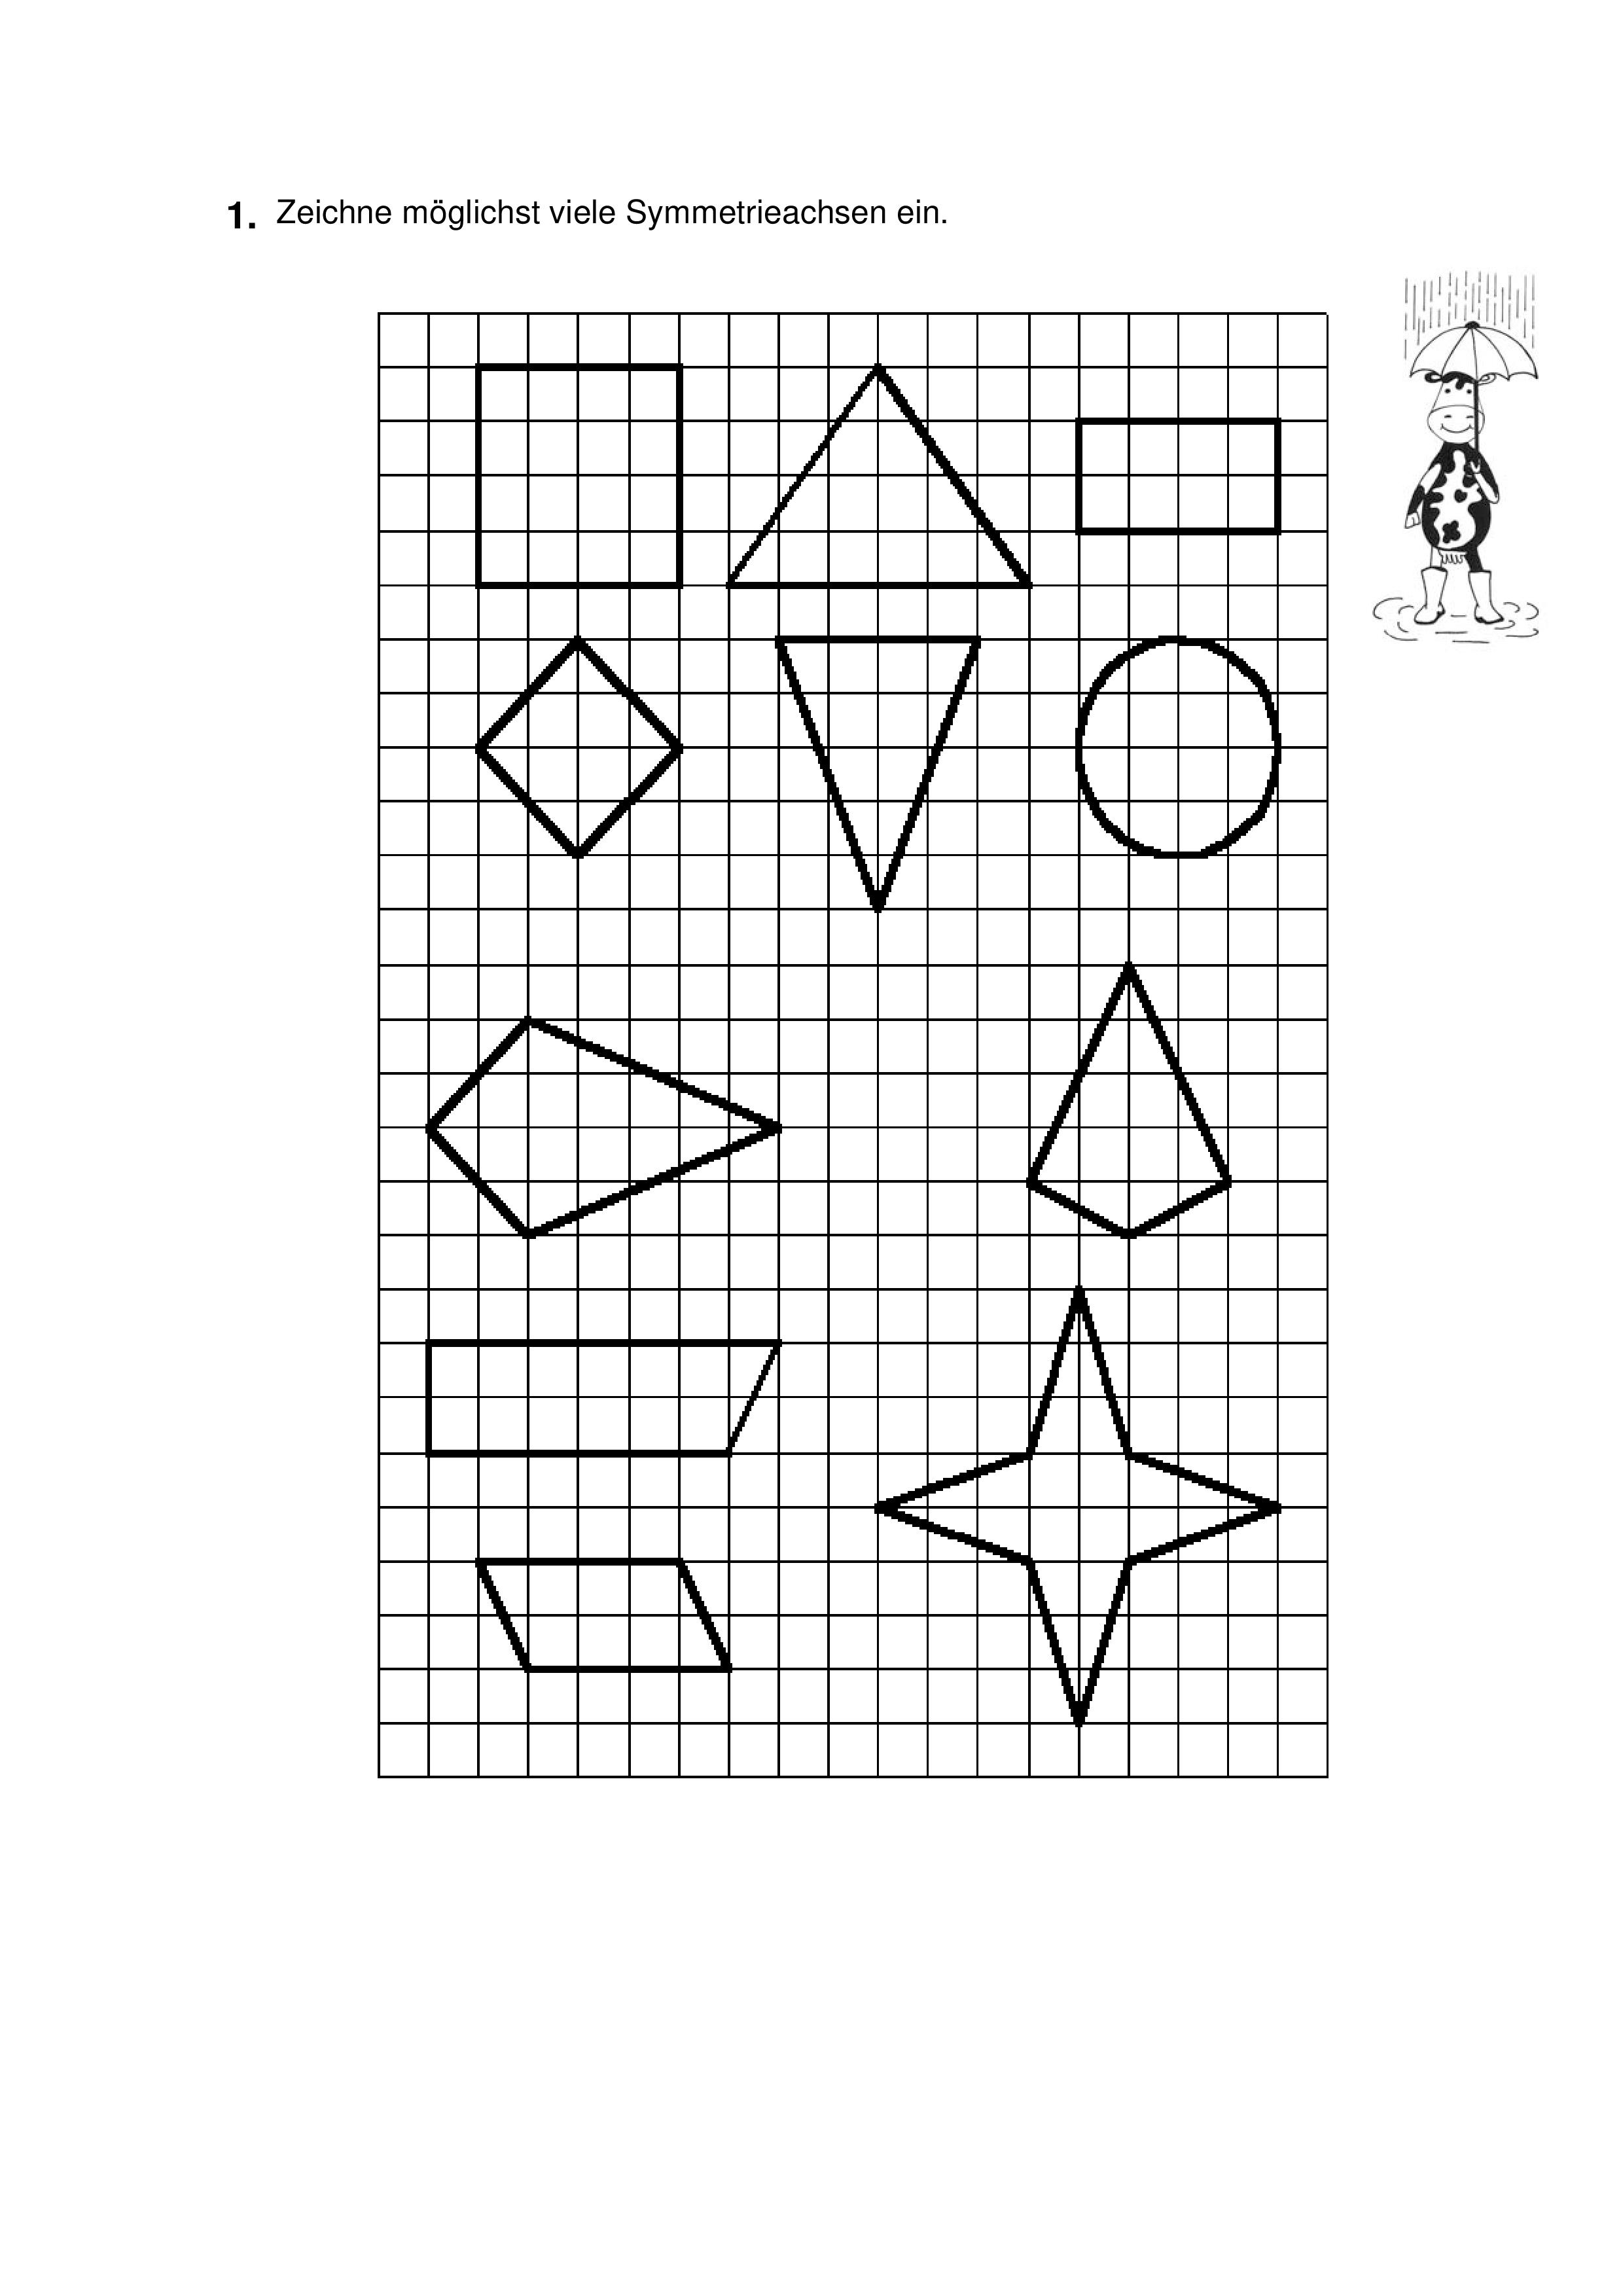 vera 3 4 symmetrie unterrichtsmaterial im fach mathematik. Black Bedroom Furniture Sets. Home Design Ideas